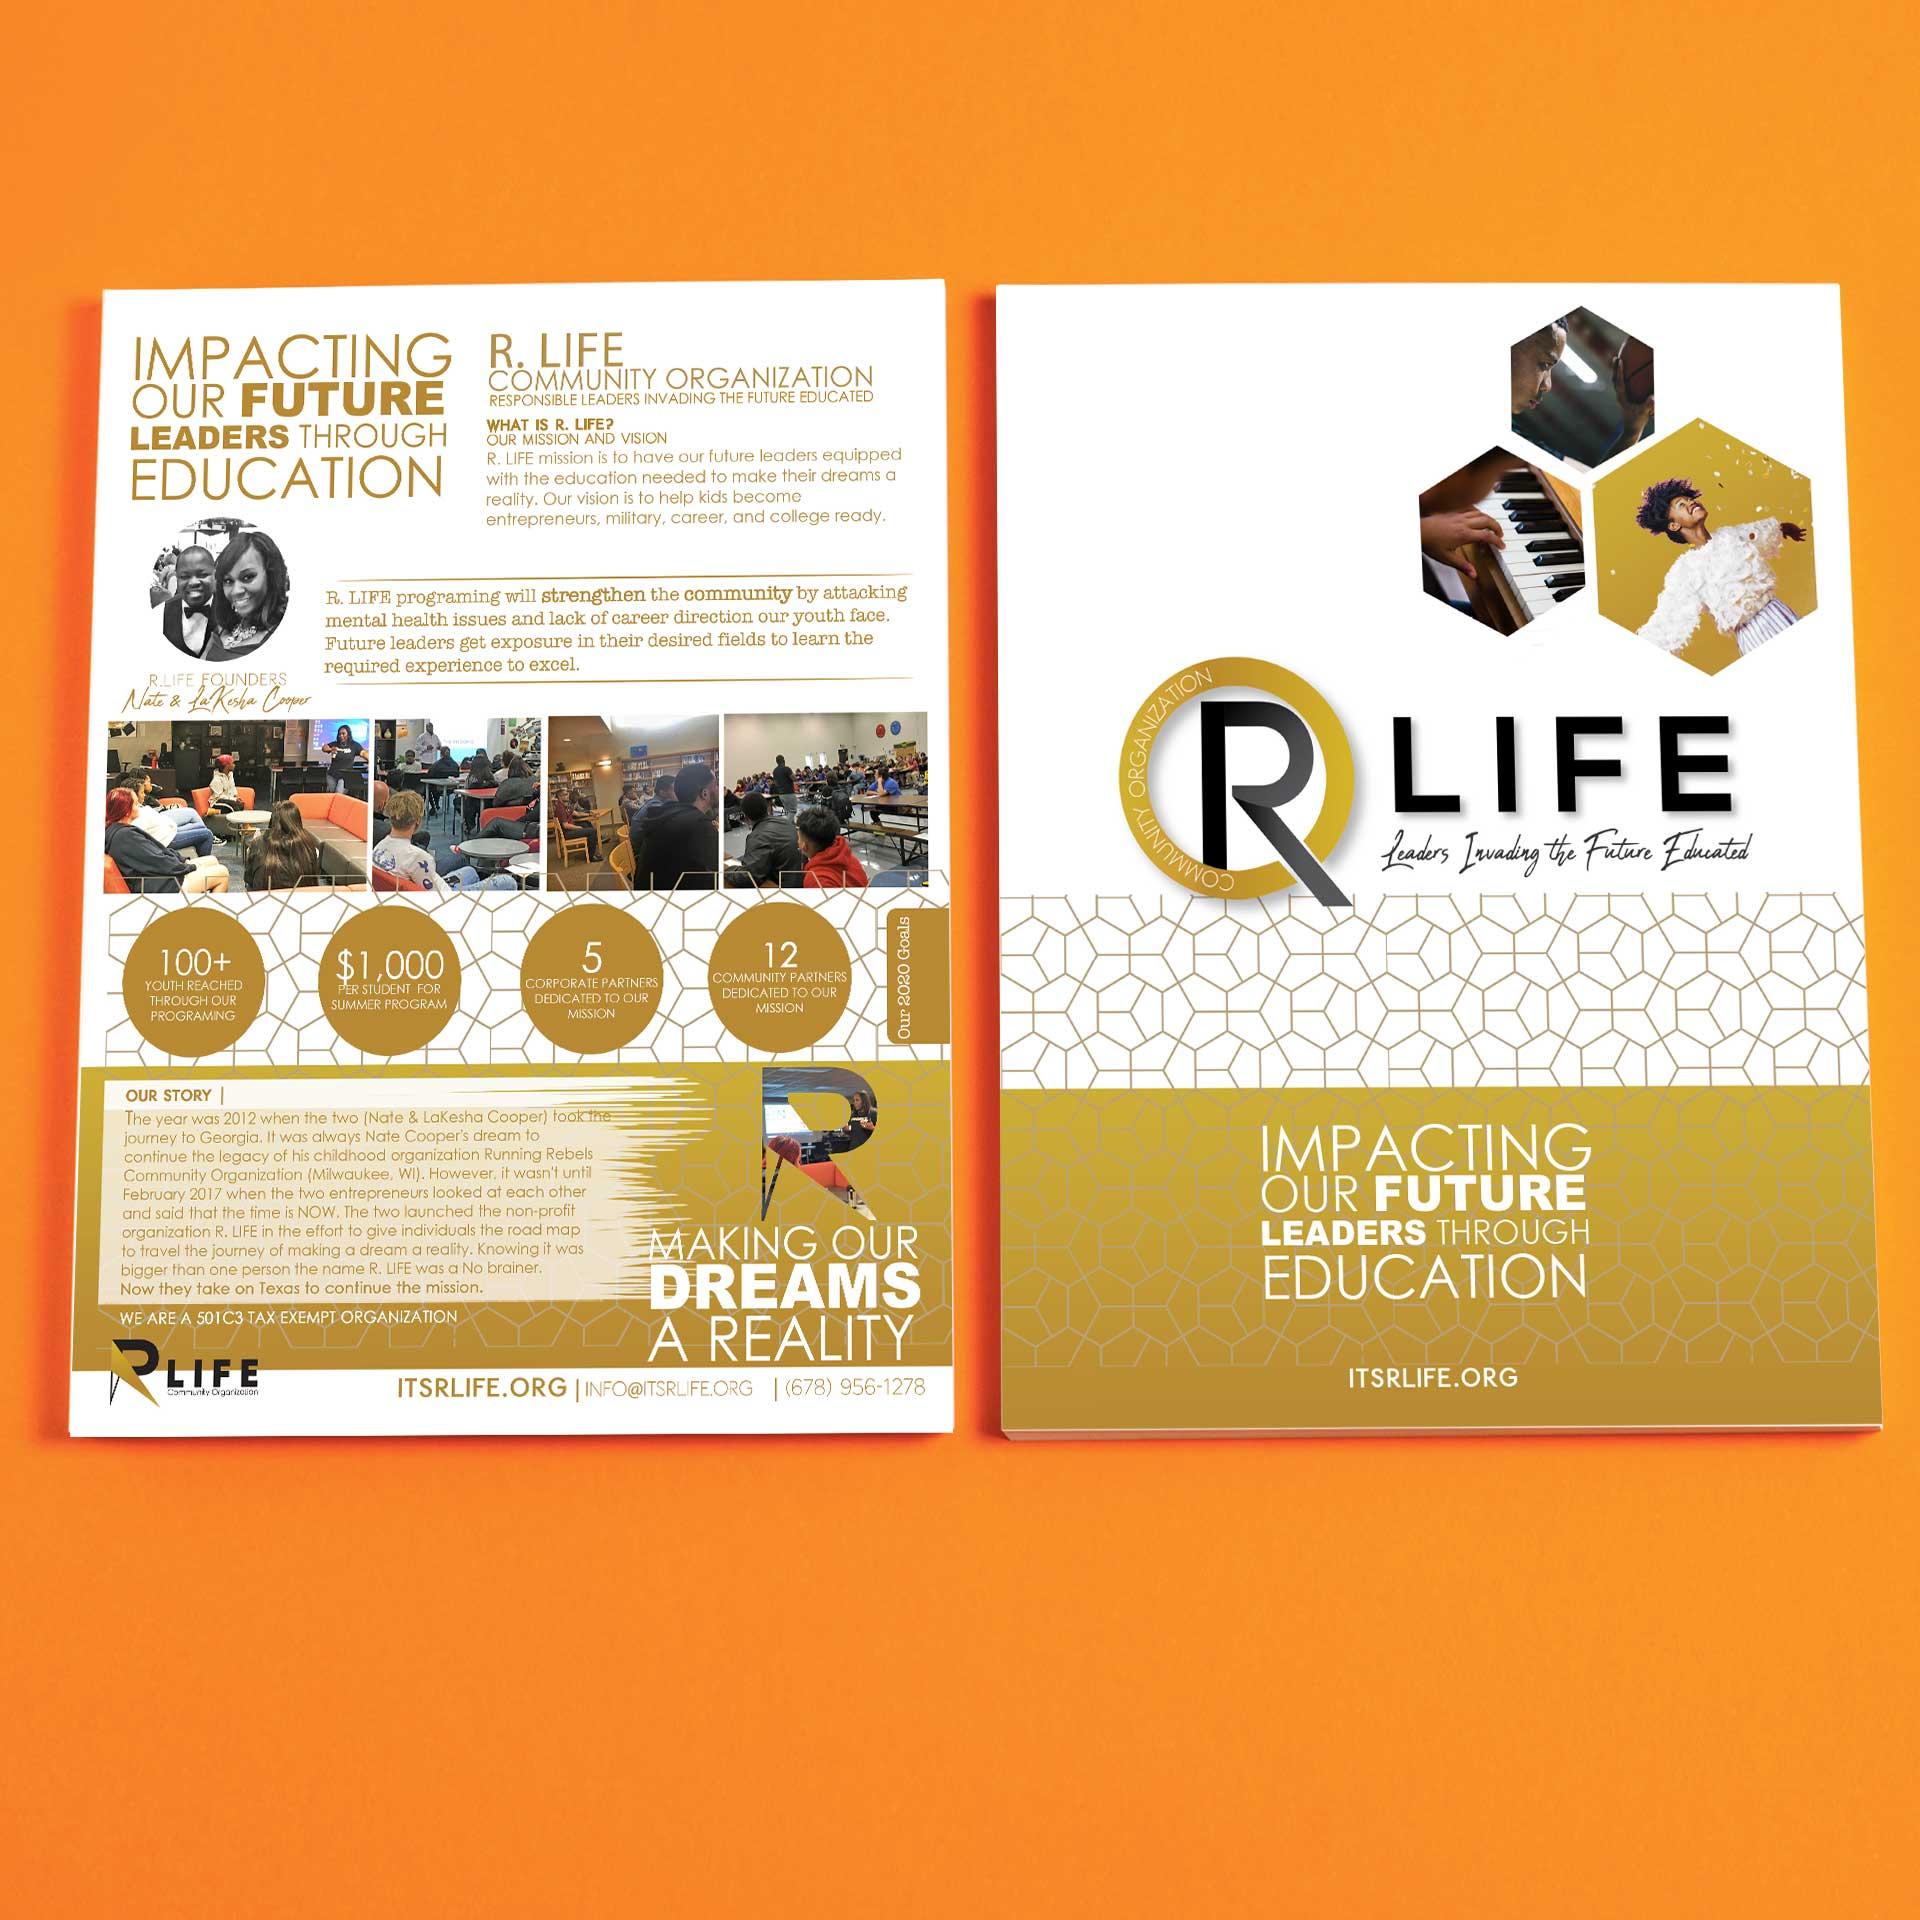 R LIFE Community Organization Non Profit One Pager Design